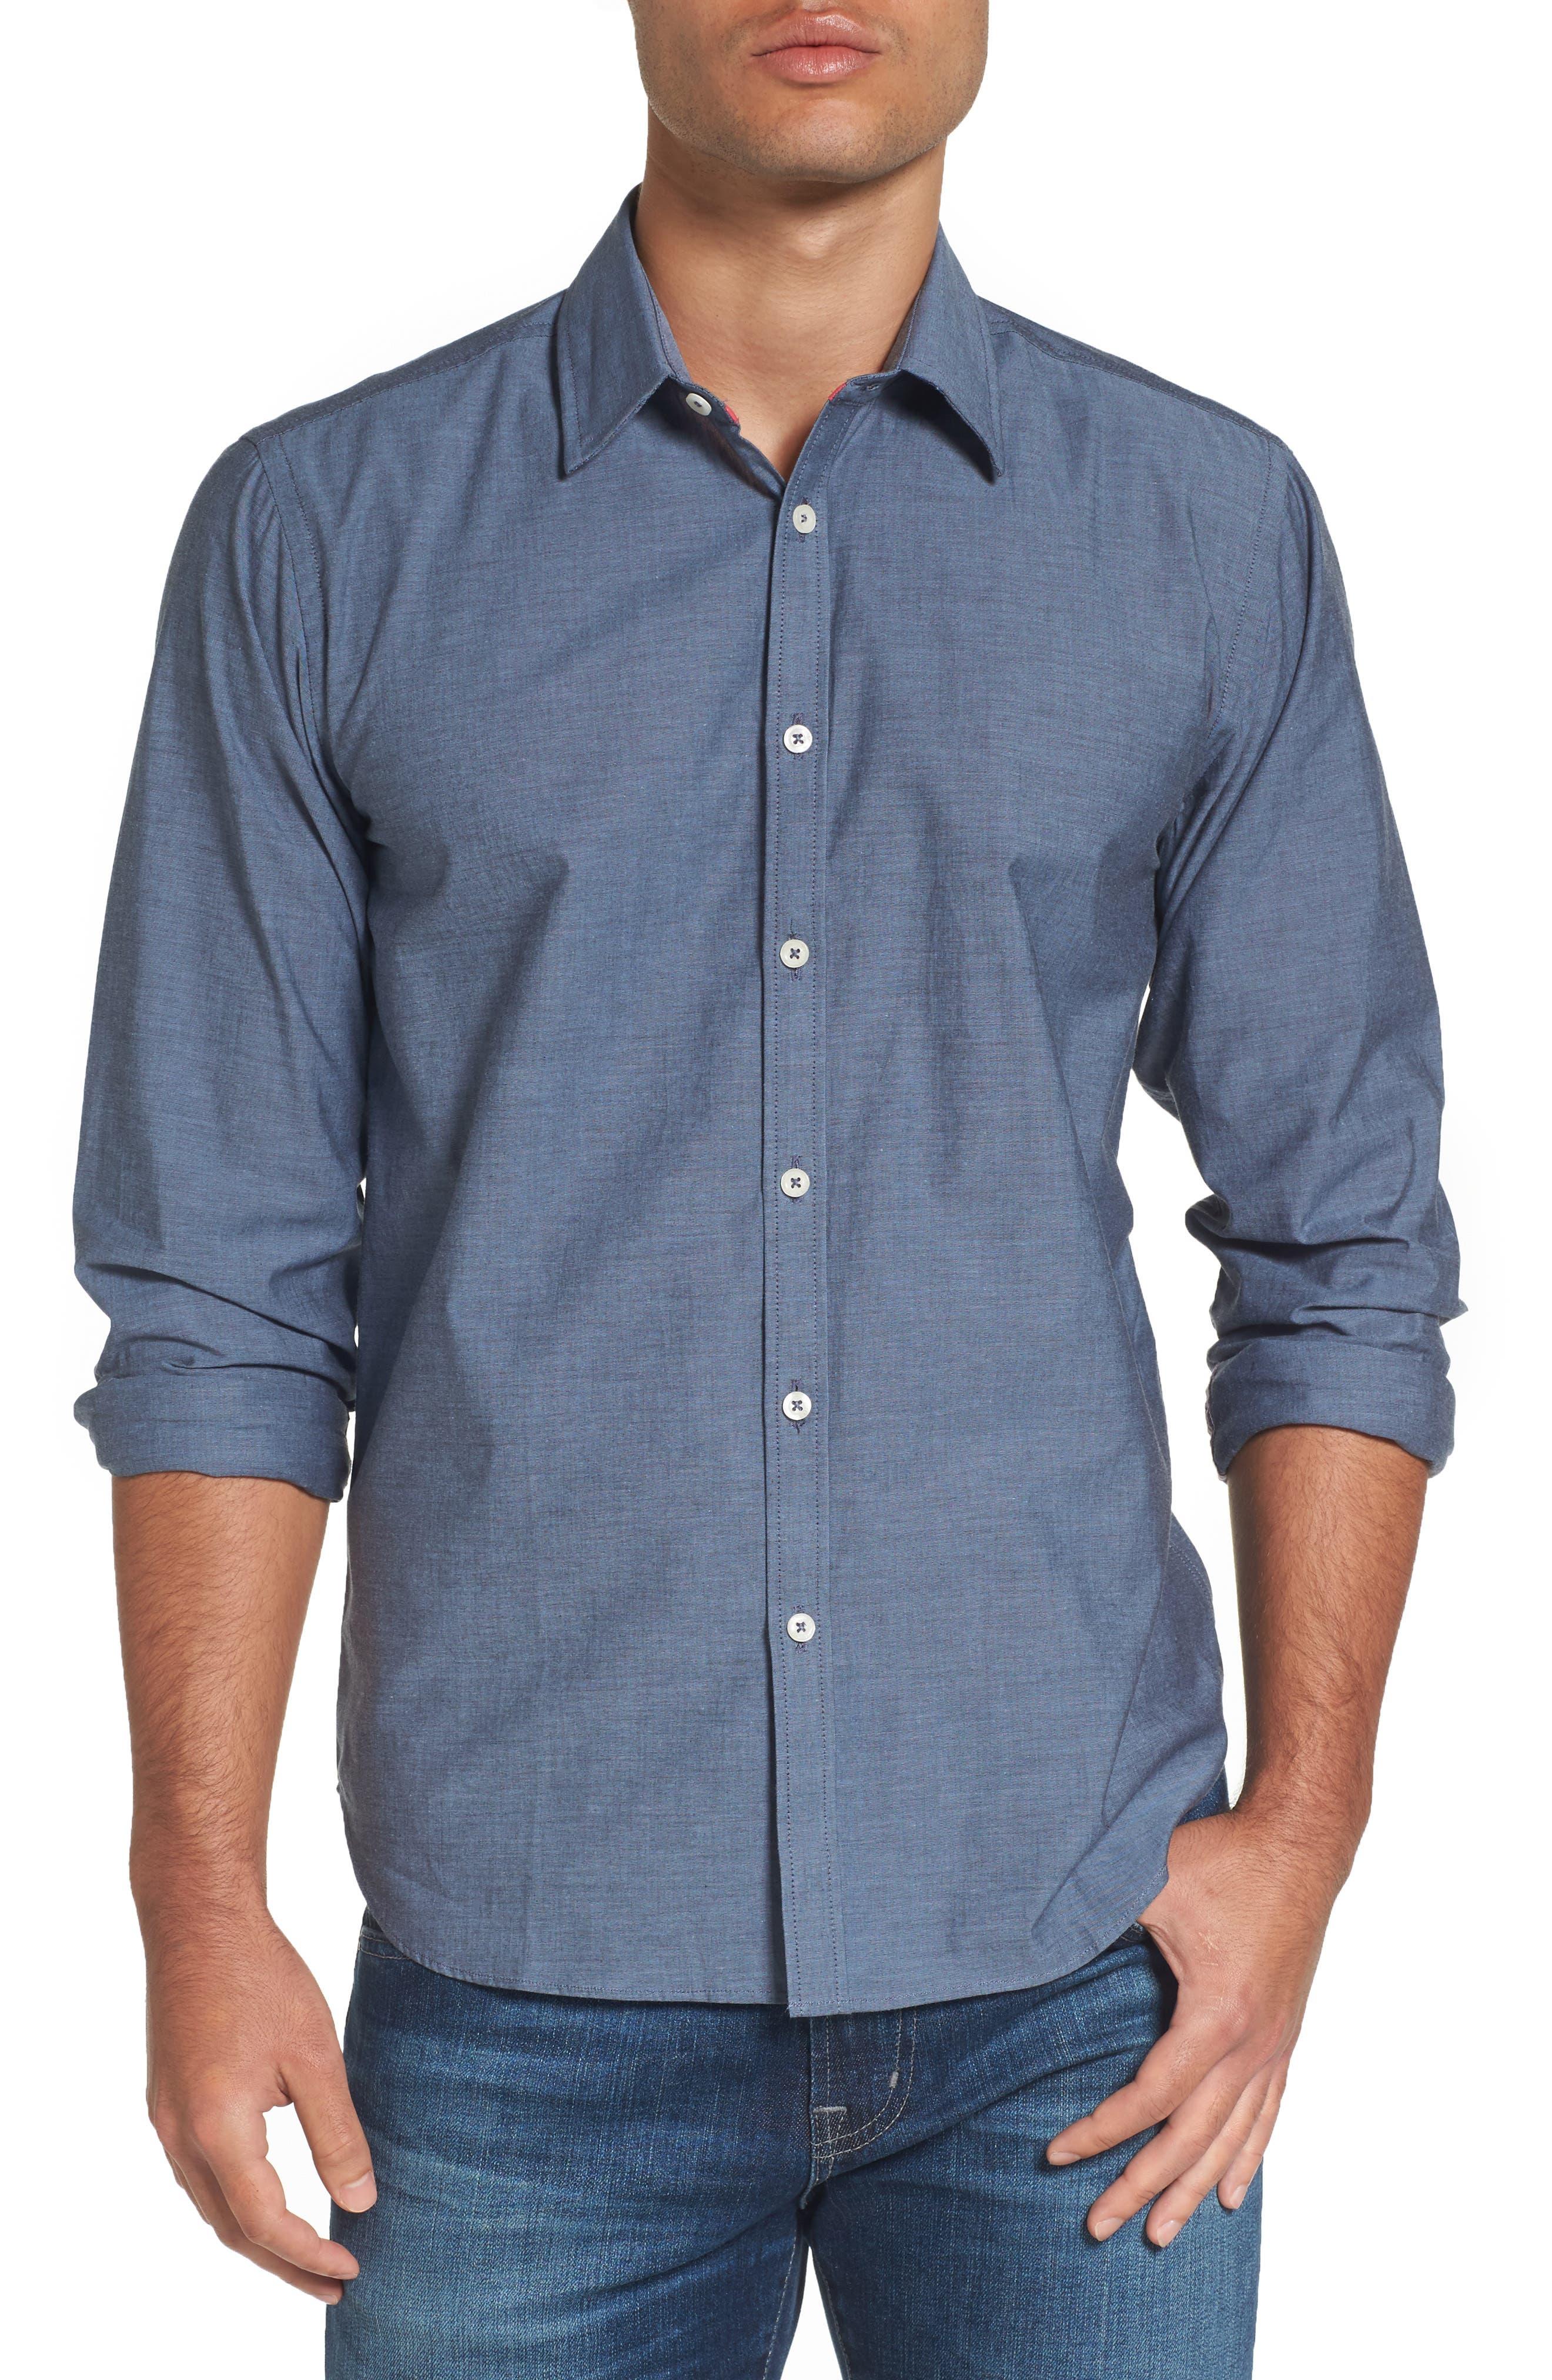 Jeremy Argyle Fitted Sport Shirt